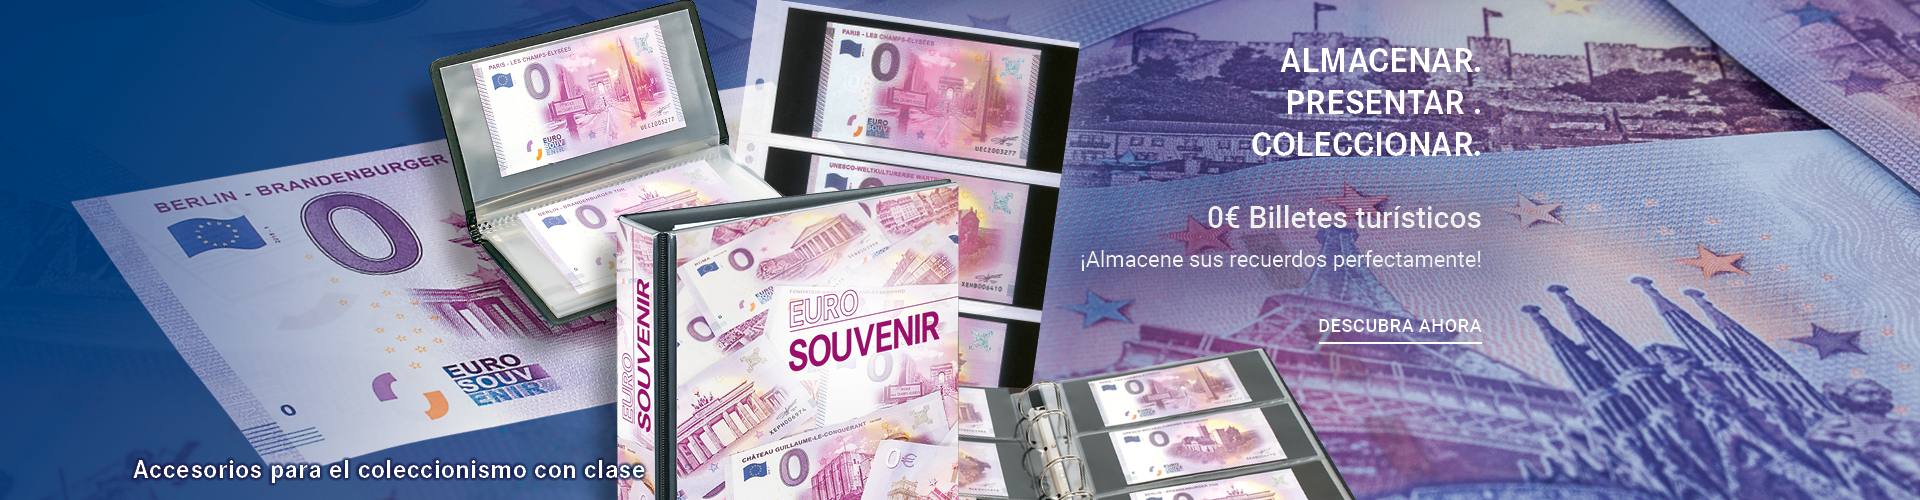 Billetes turisticos euro souvenir